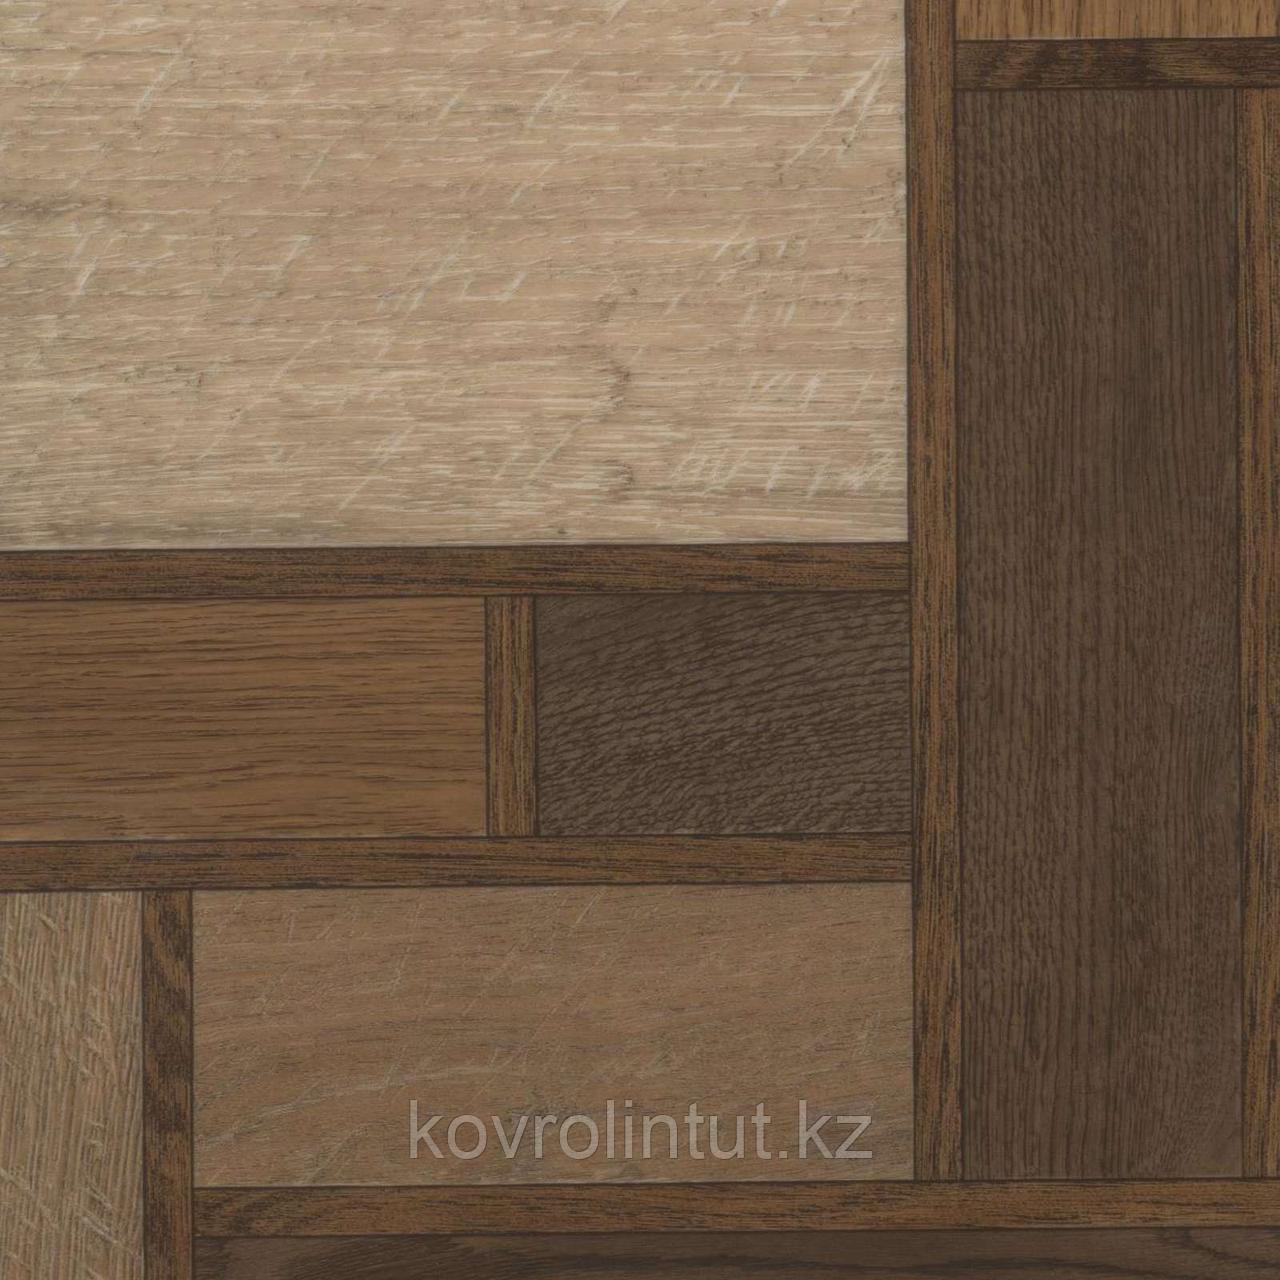 Линолеум Tarkett бытовой Favorit Stobo 1 3,5 м